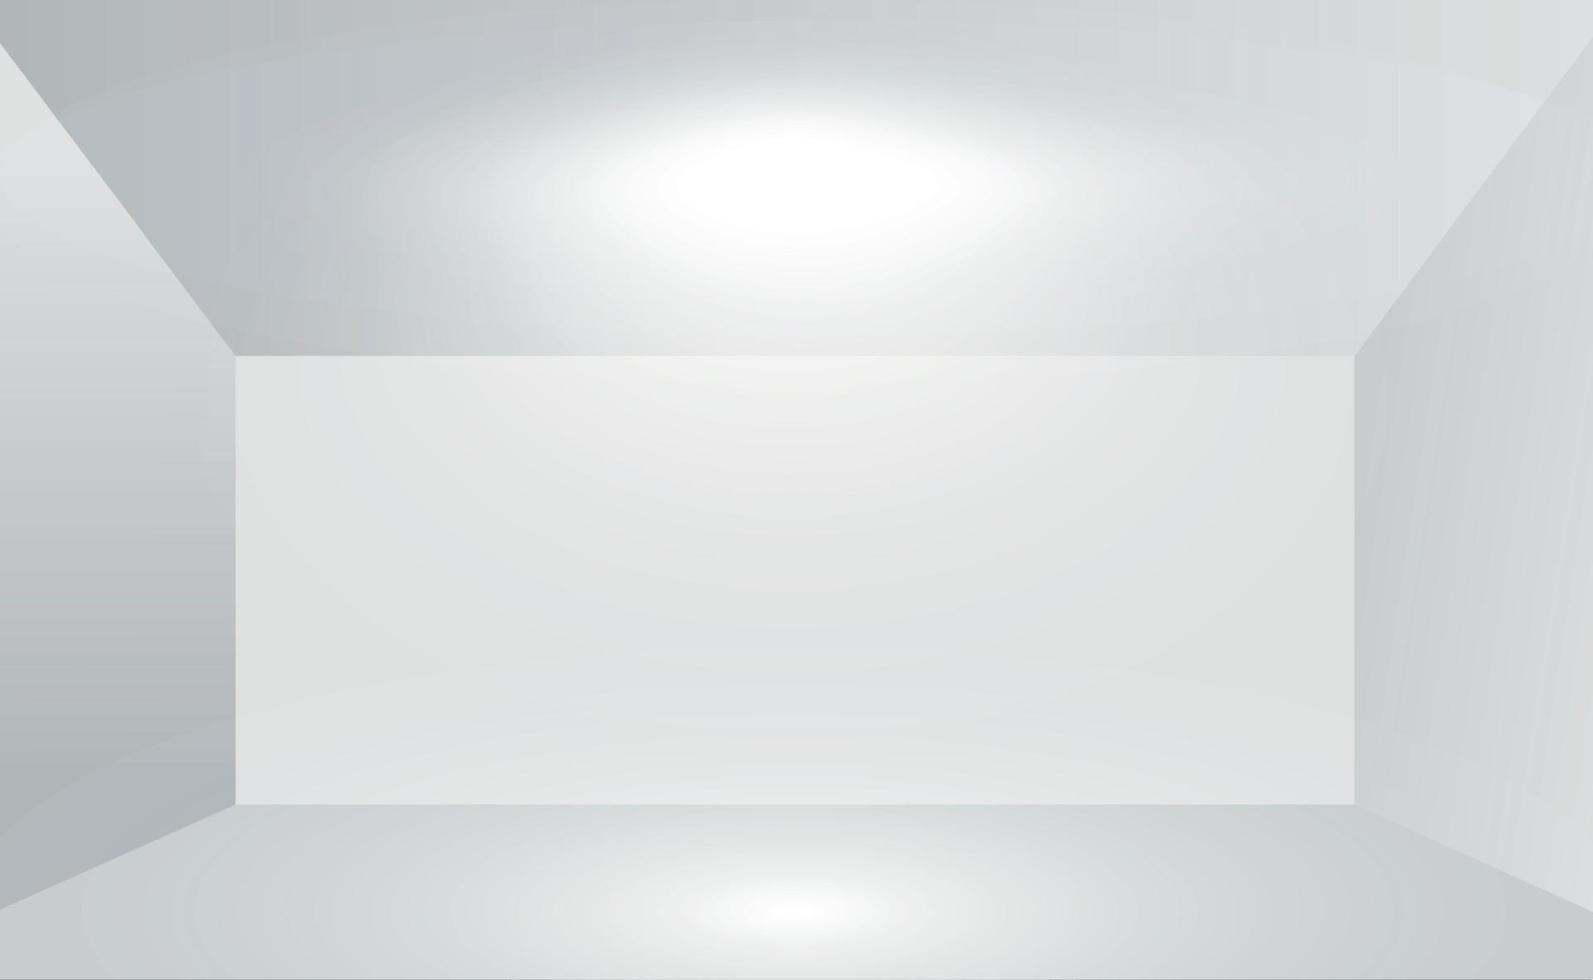 volumetrisk vitgrå studio, abstrakt bakgrund - vektorillustration vektor